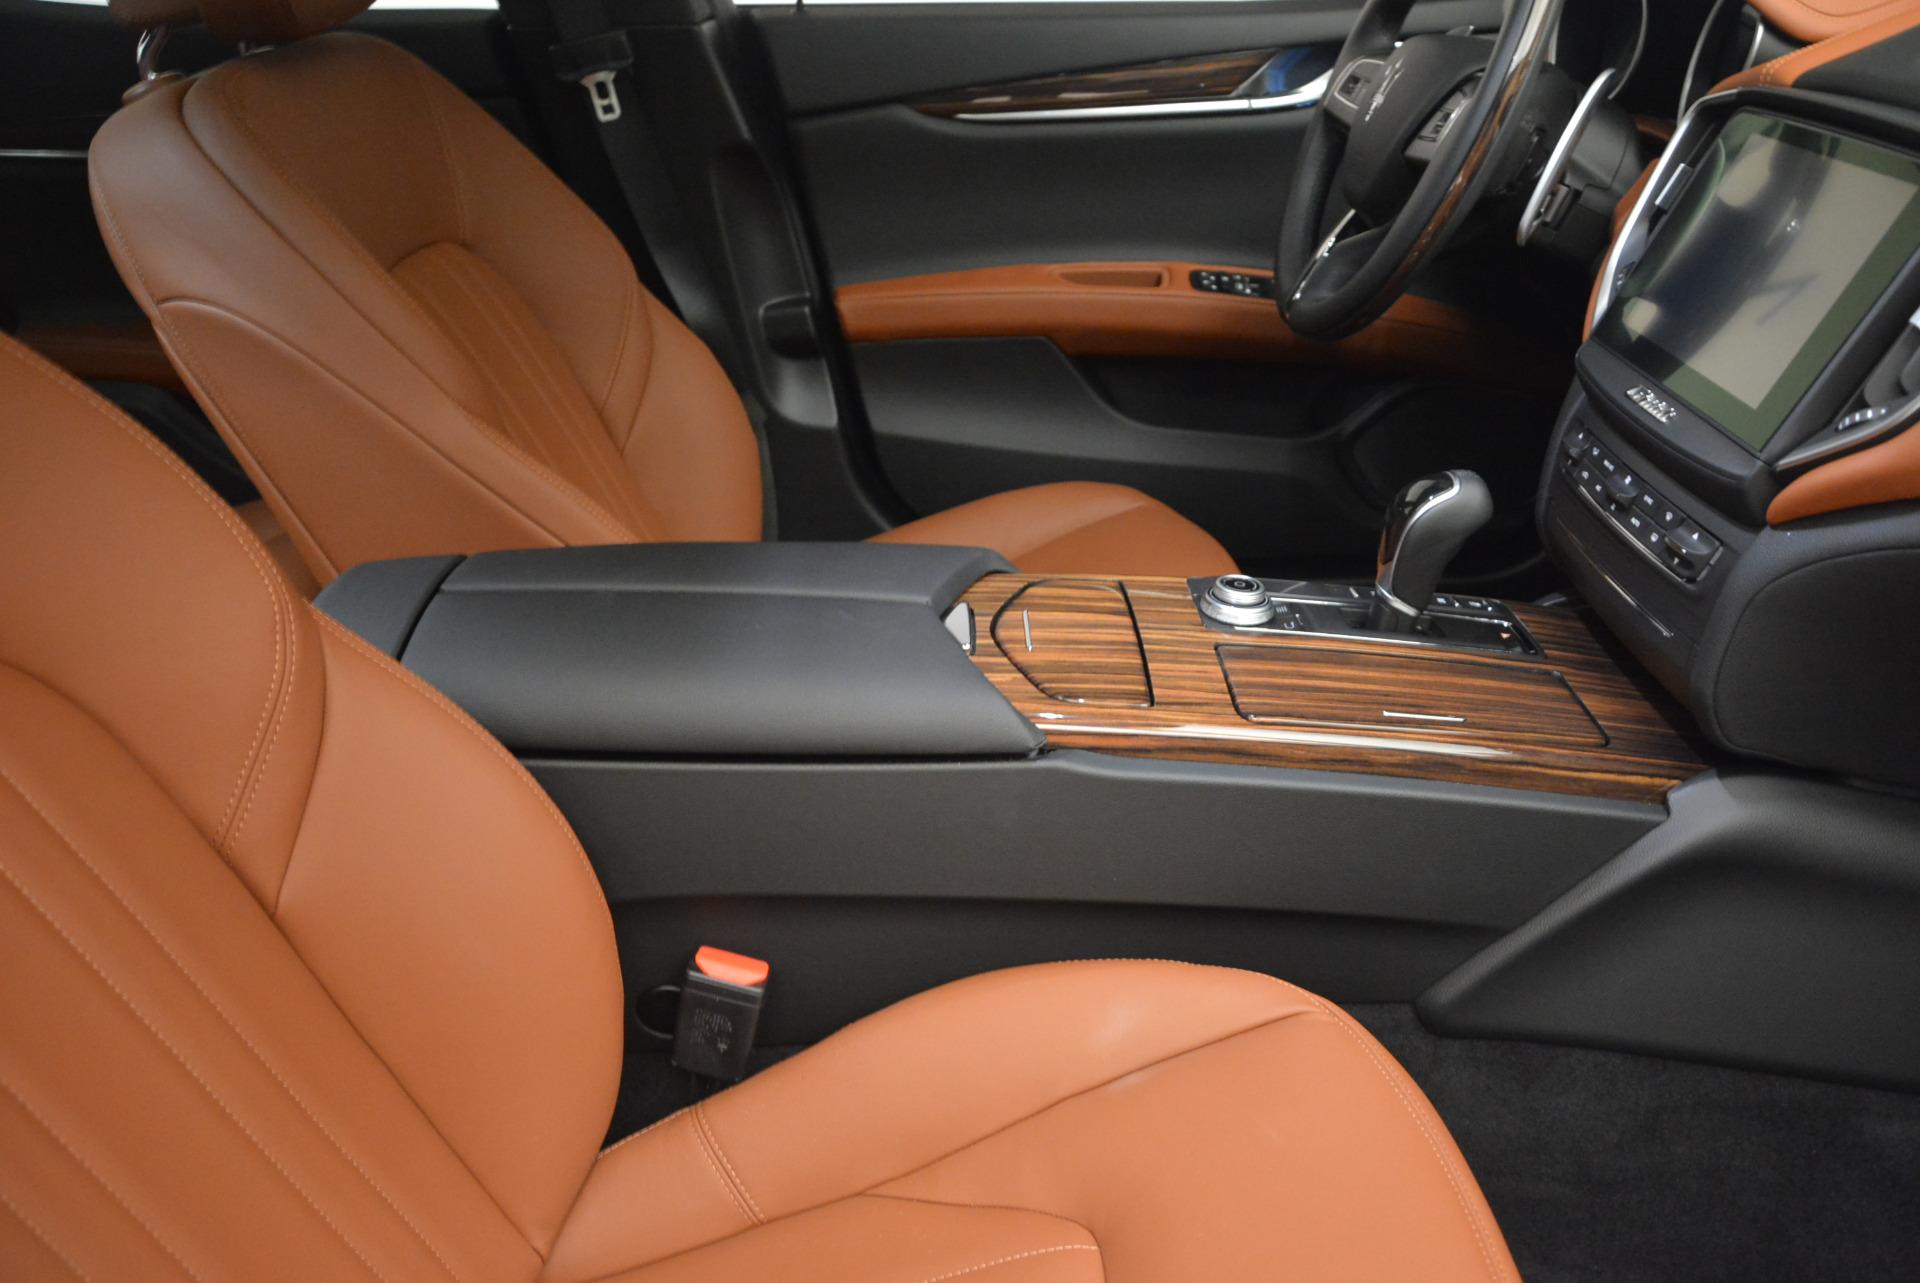 Used 2017 Maserati Ghibli S Q4  EX-LOANER For Sale In Westport, CT 565_p20